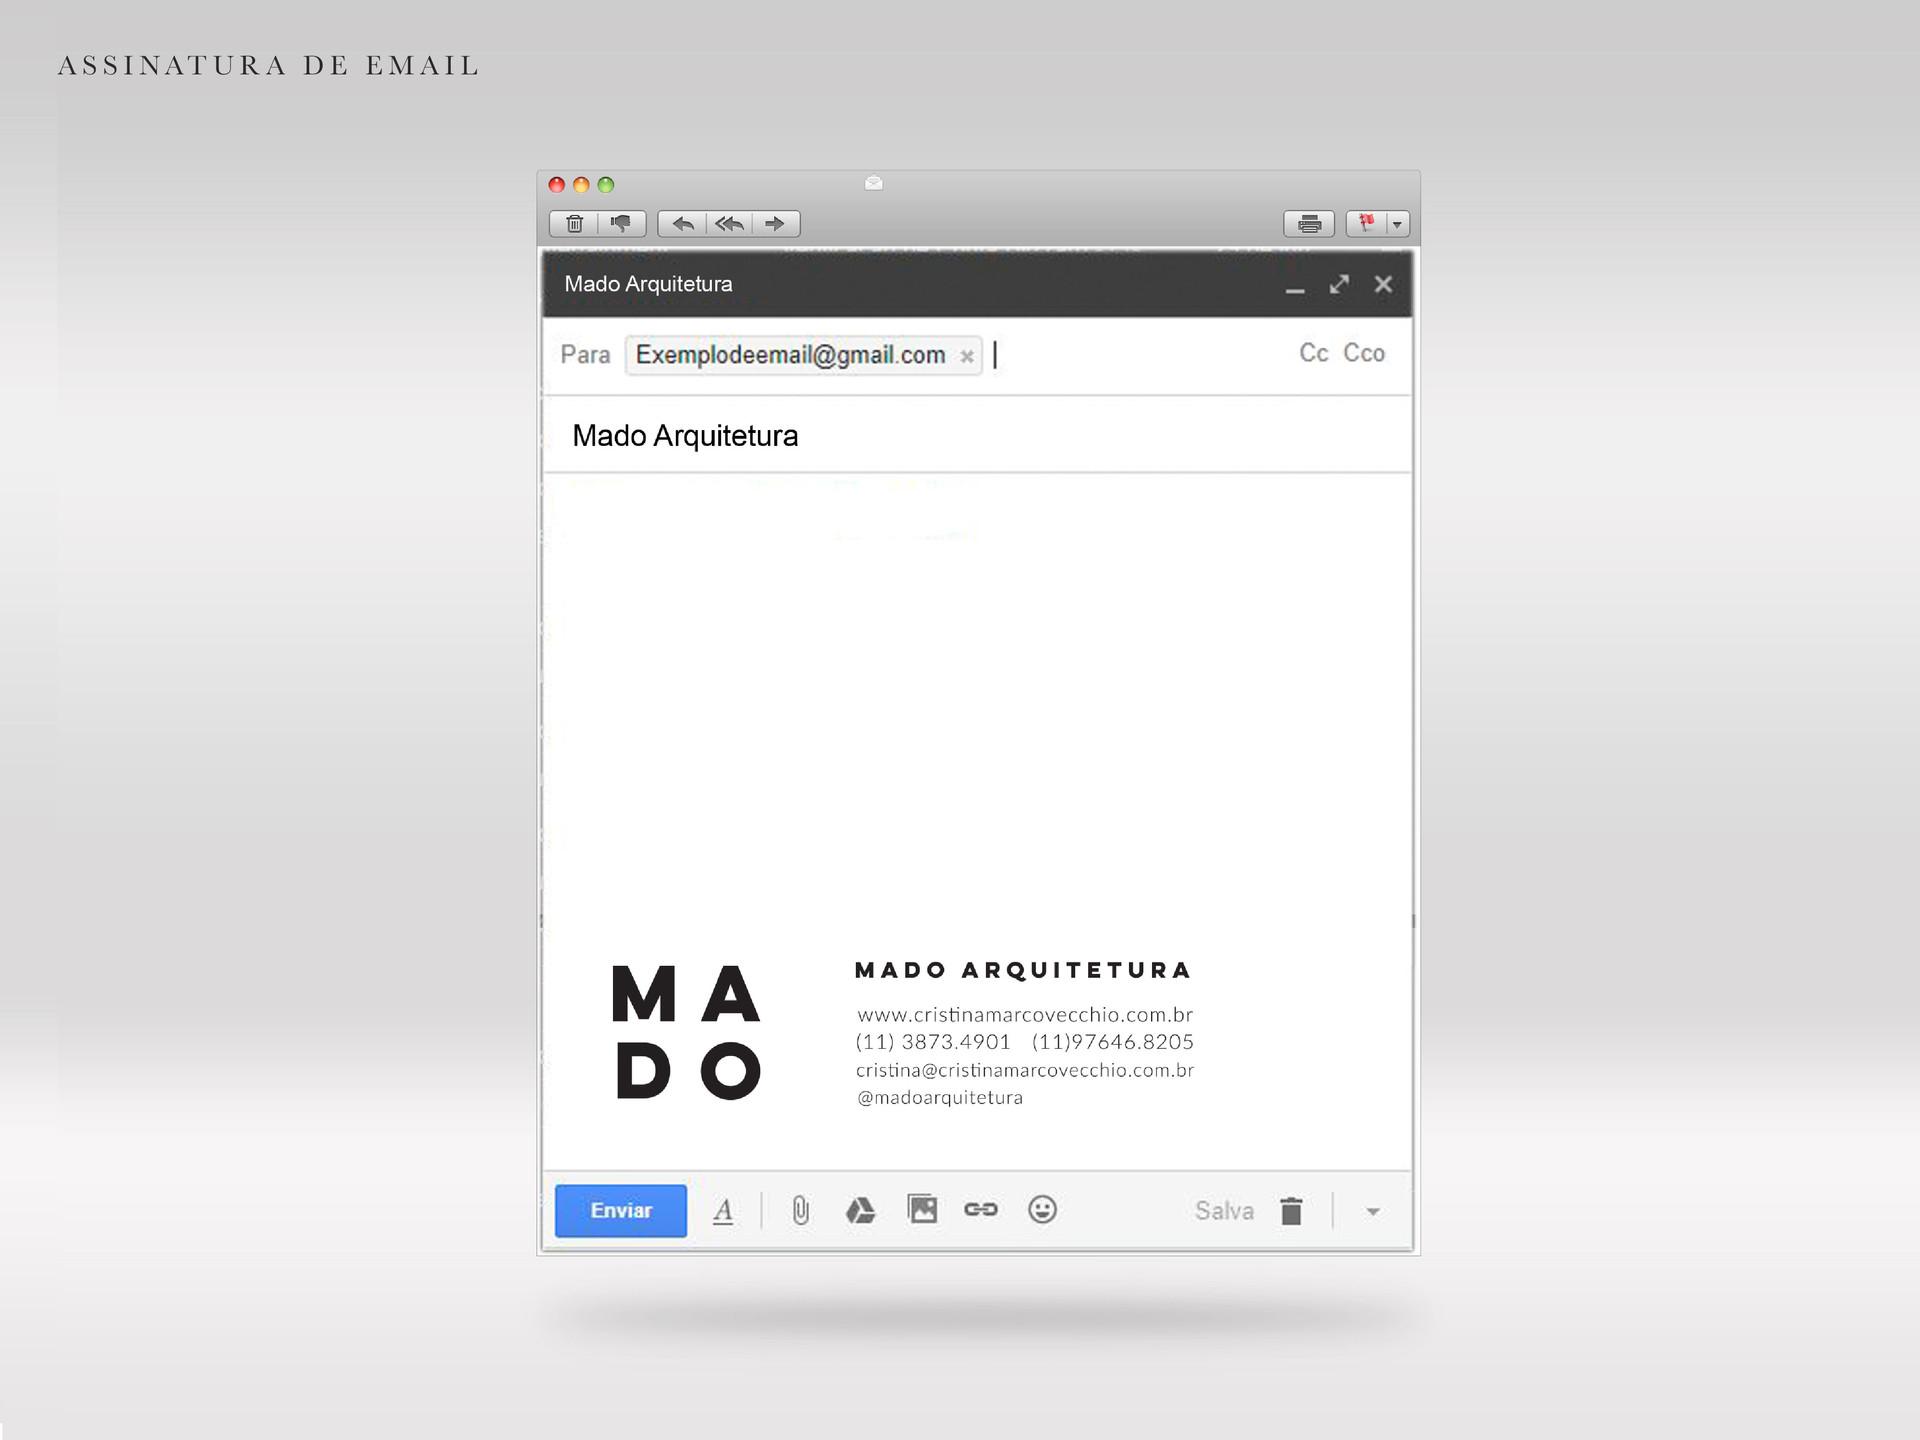 MADO_ASS-EMAIL.jpg